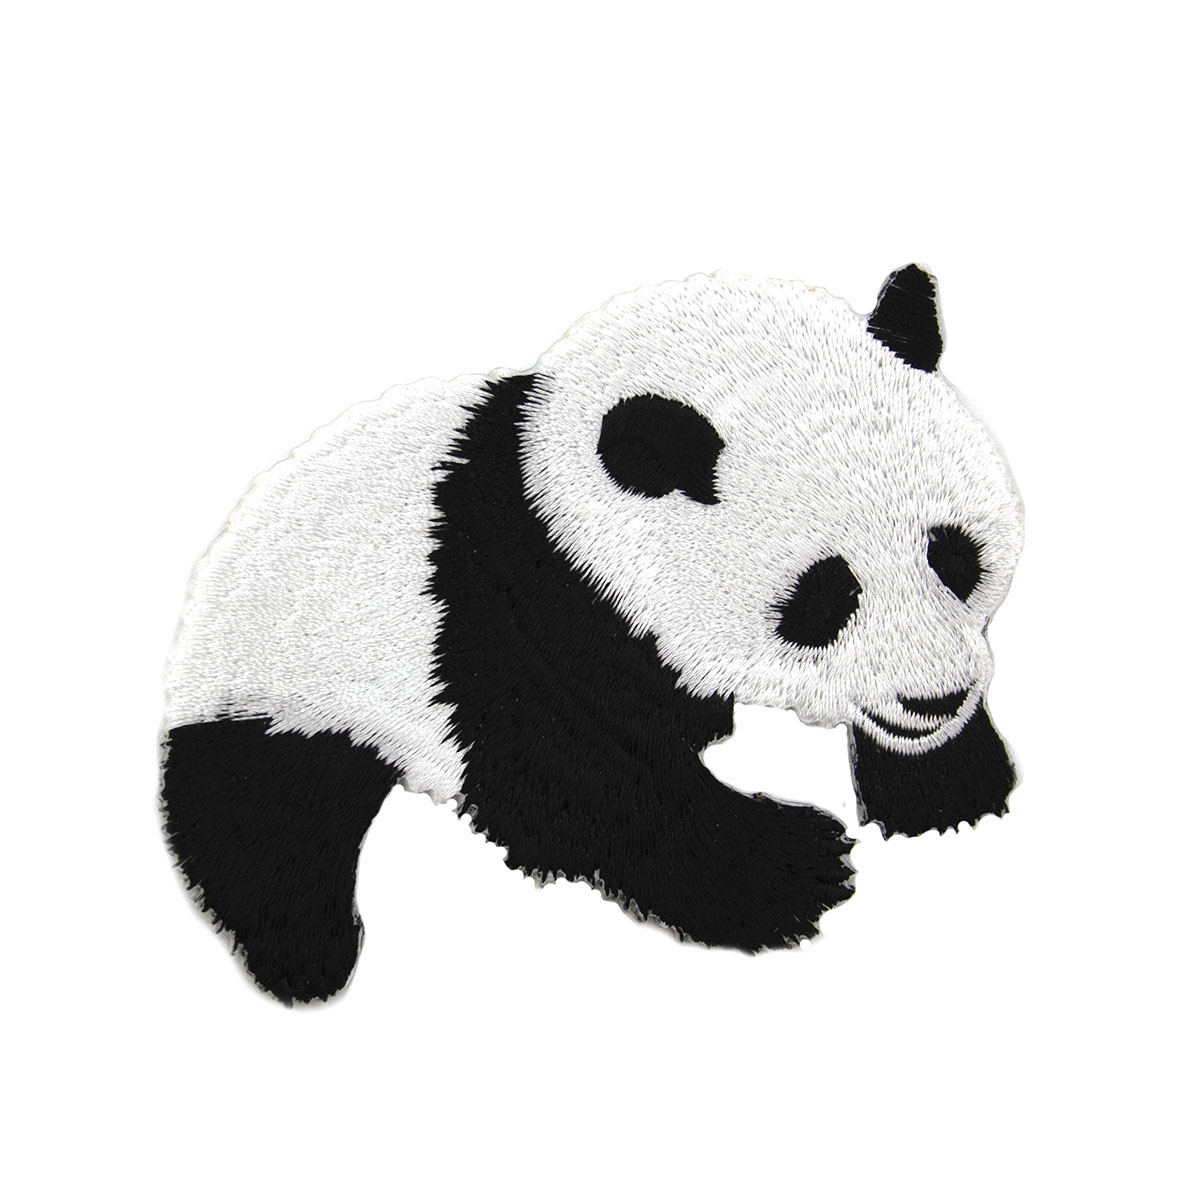 AD1136 Термоаппликация 'Большая панда', 7*9 см, Hobby&Pro